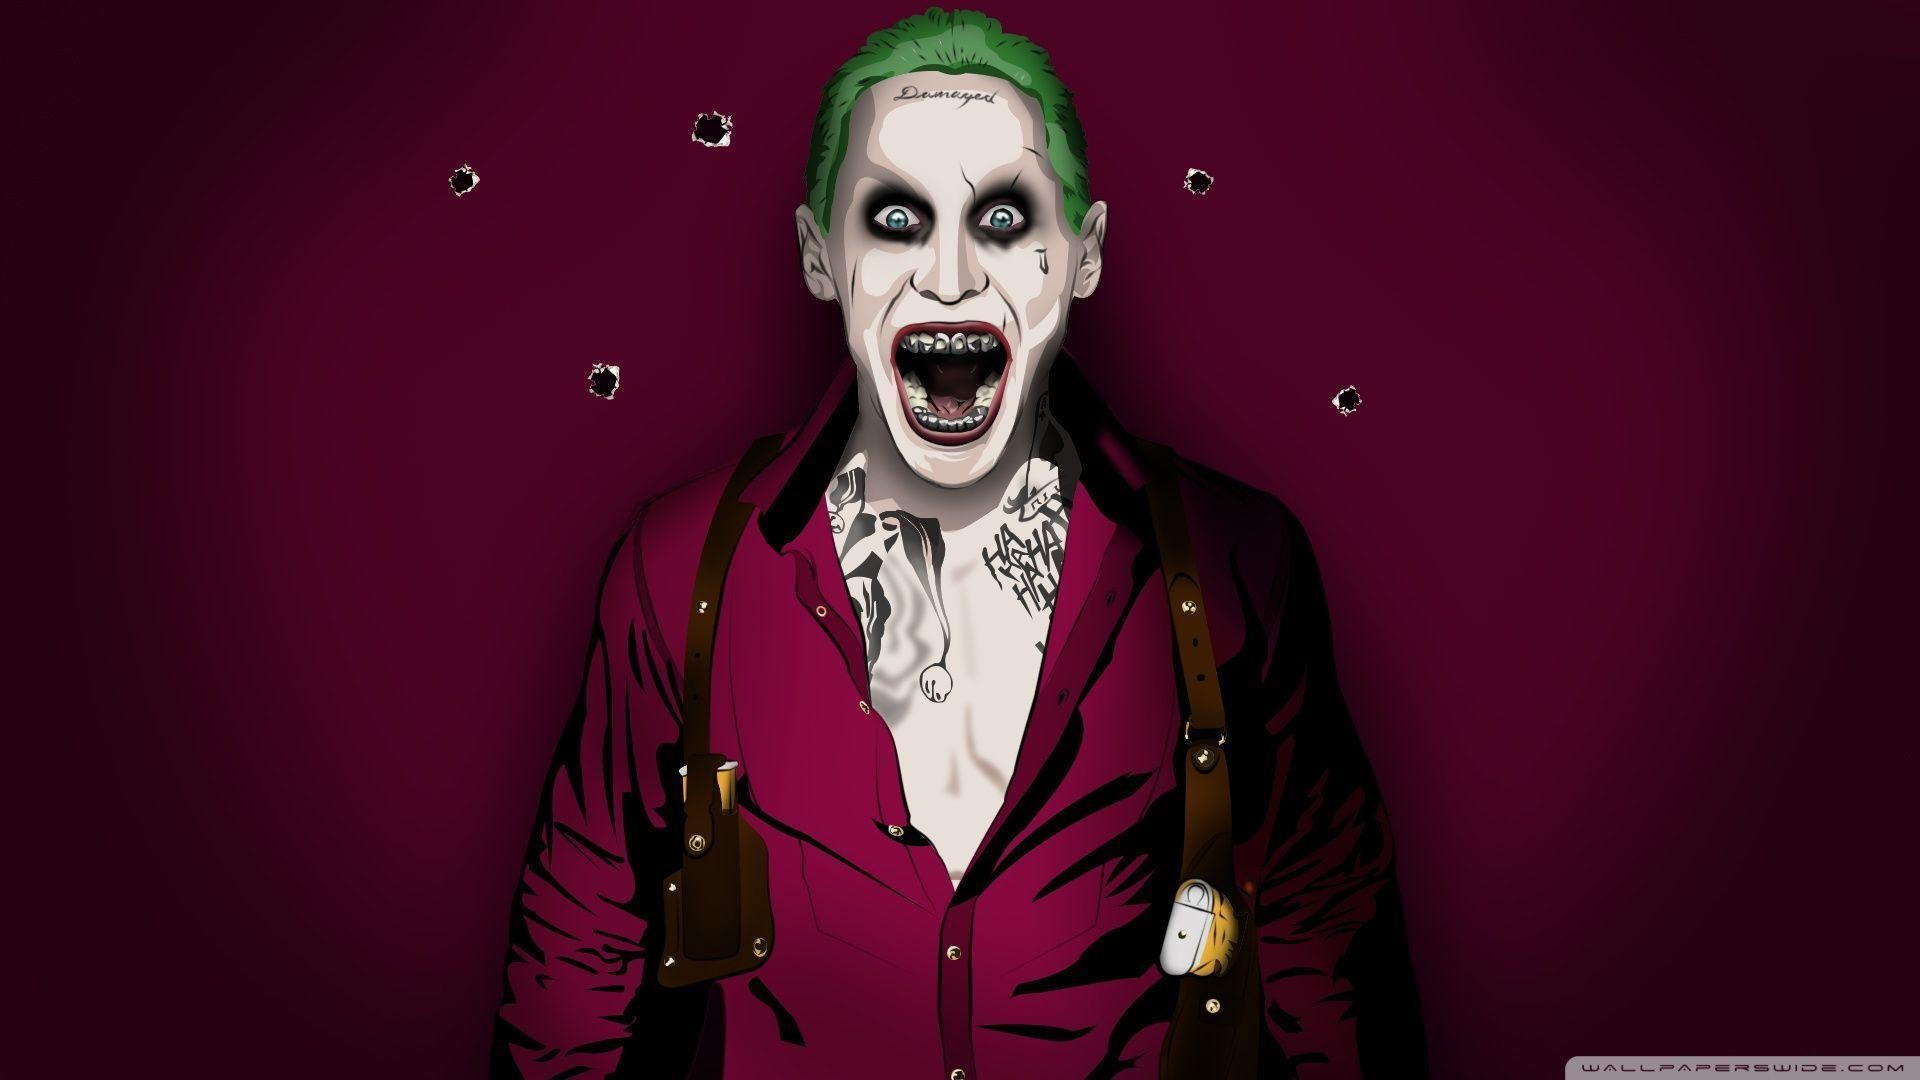 Jared Leto Joker Wallpaper Hd 1080p